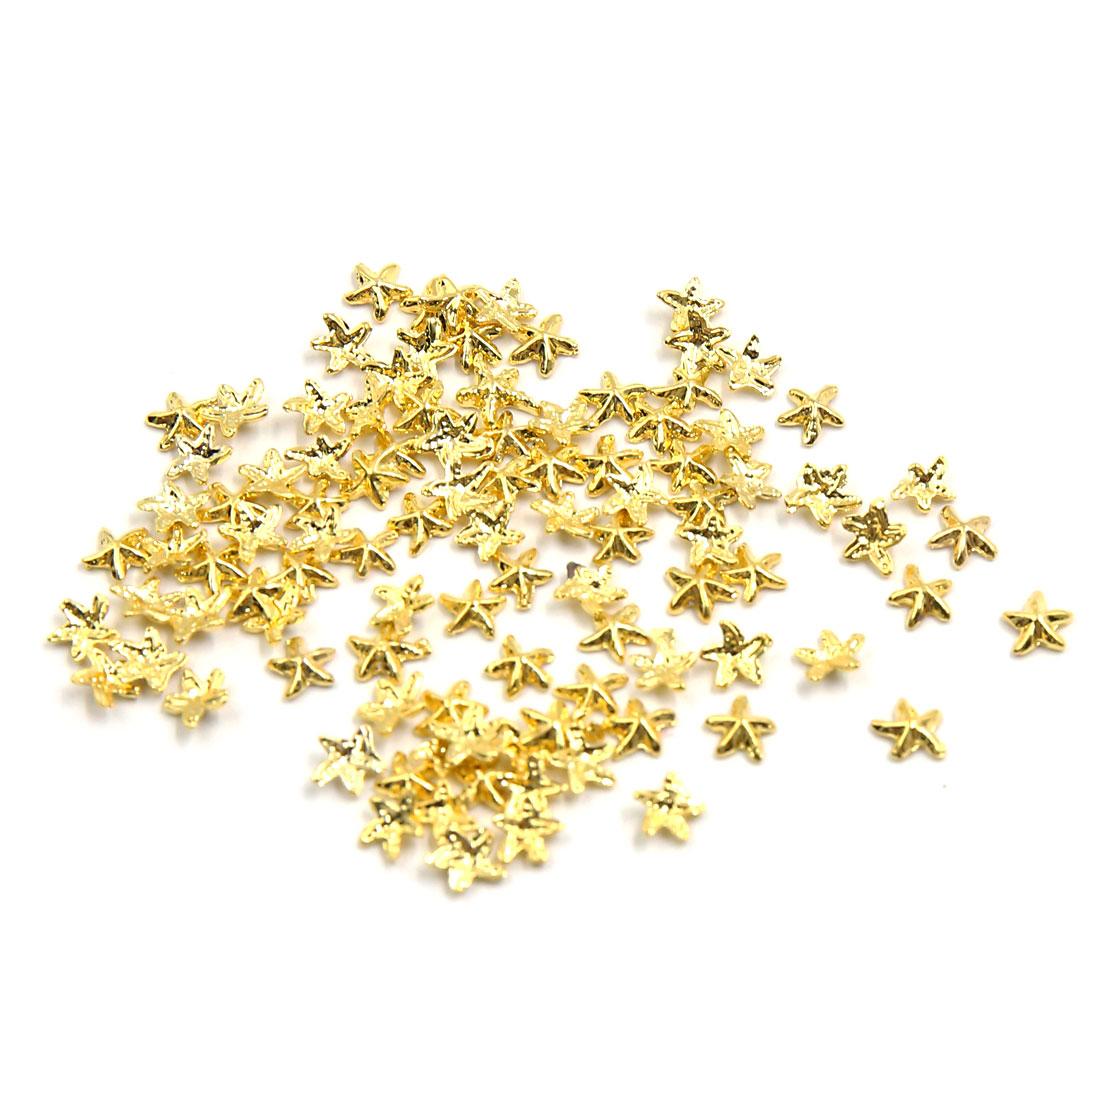 100pcs Gold Tone Starfish Shape DIY 3D Nails Art Slices Tips Decoration Ornament